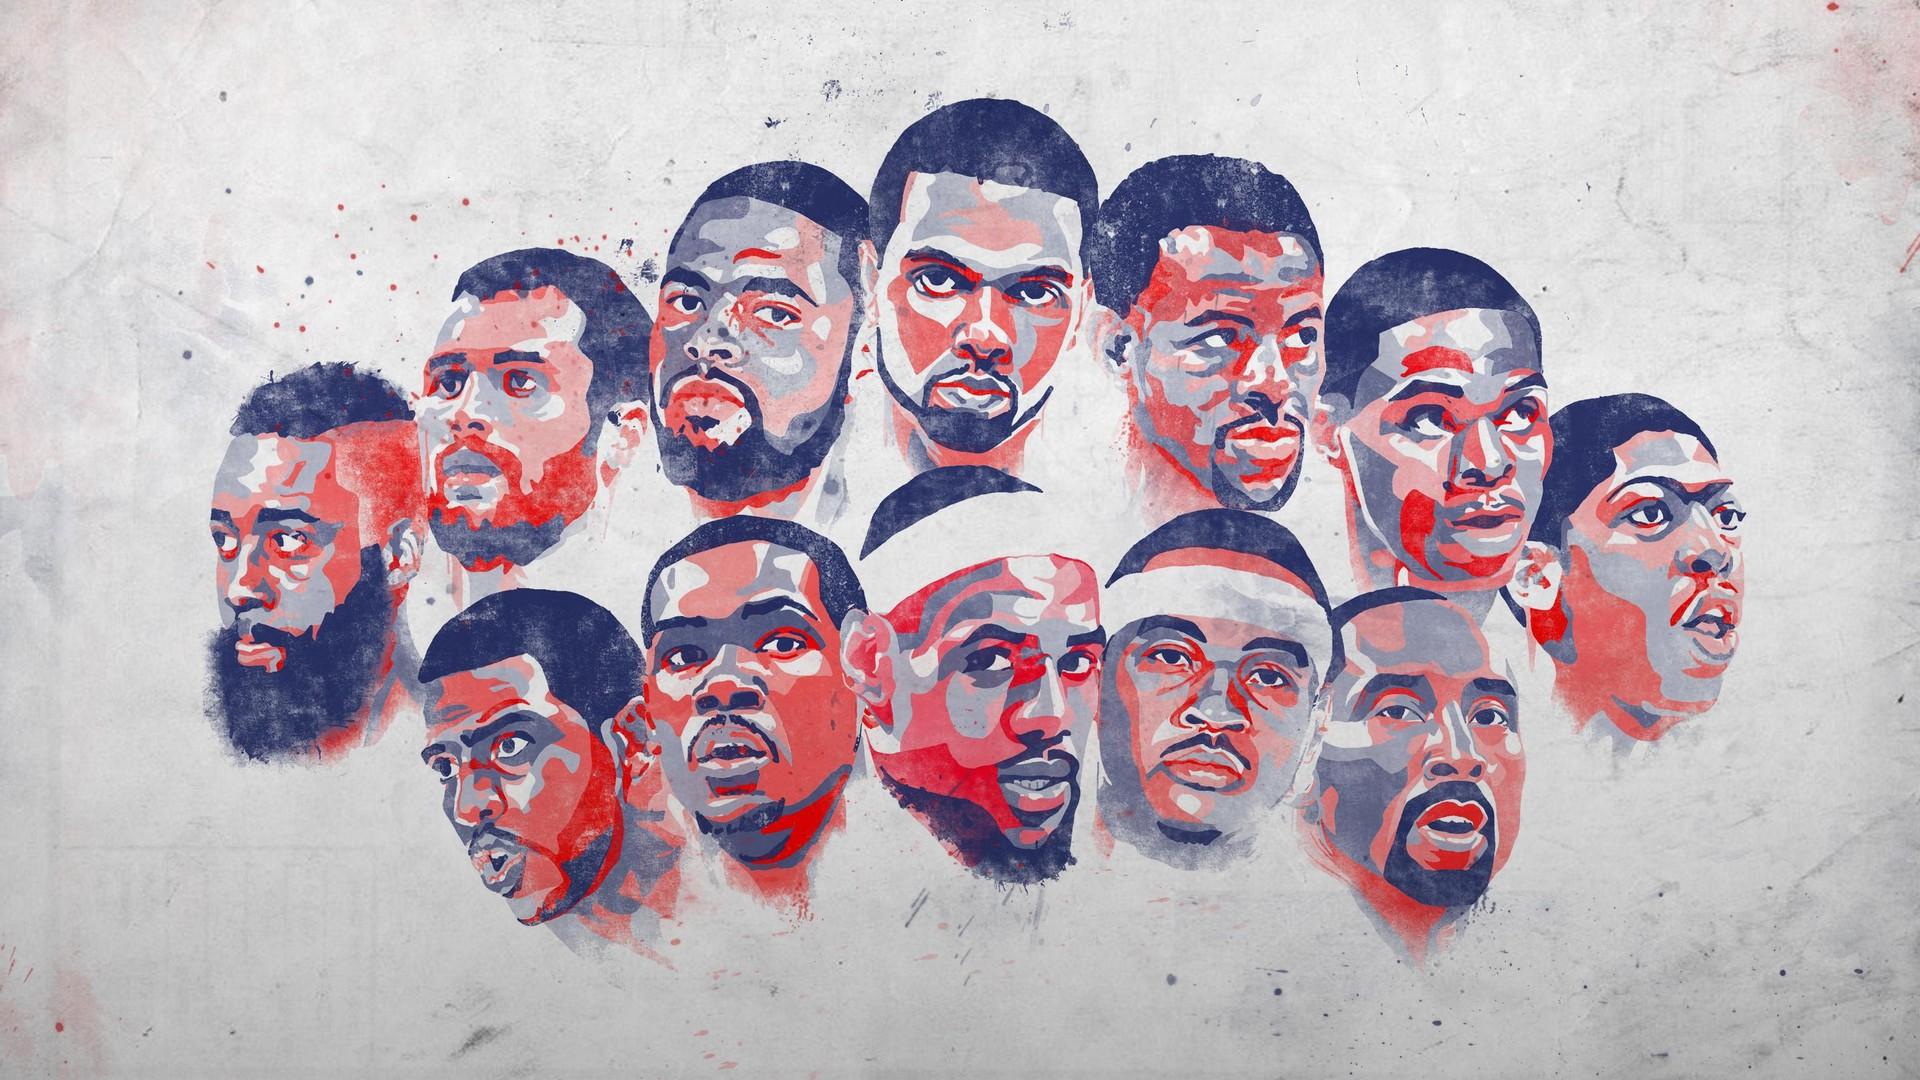 HD NBA Wallpapers 2020 Basketball Wallpaper 1920x1080